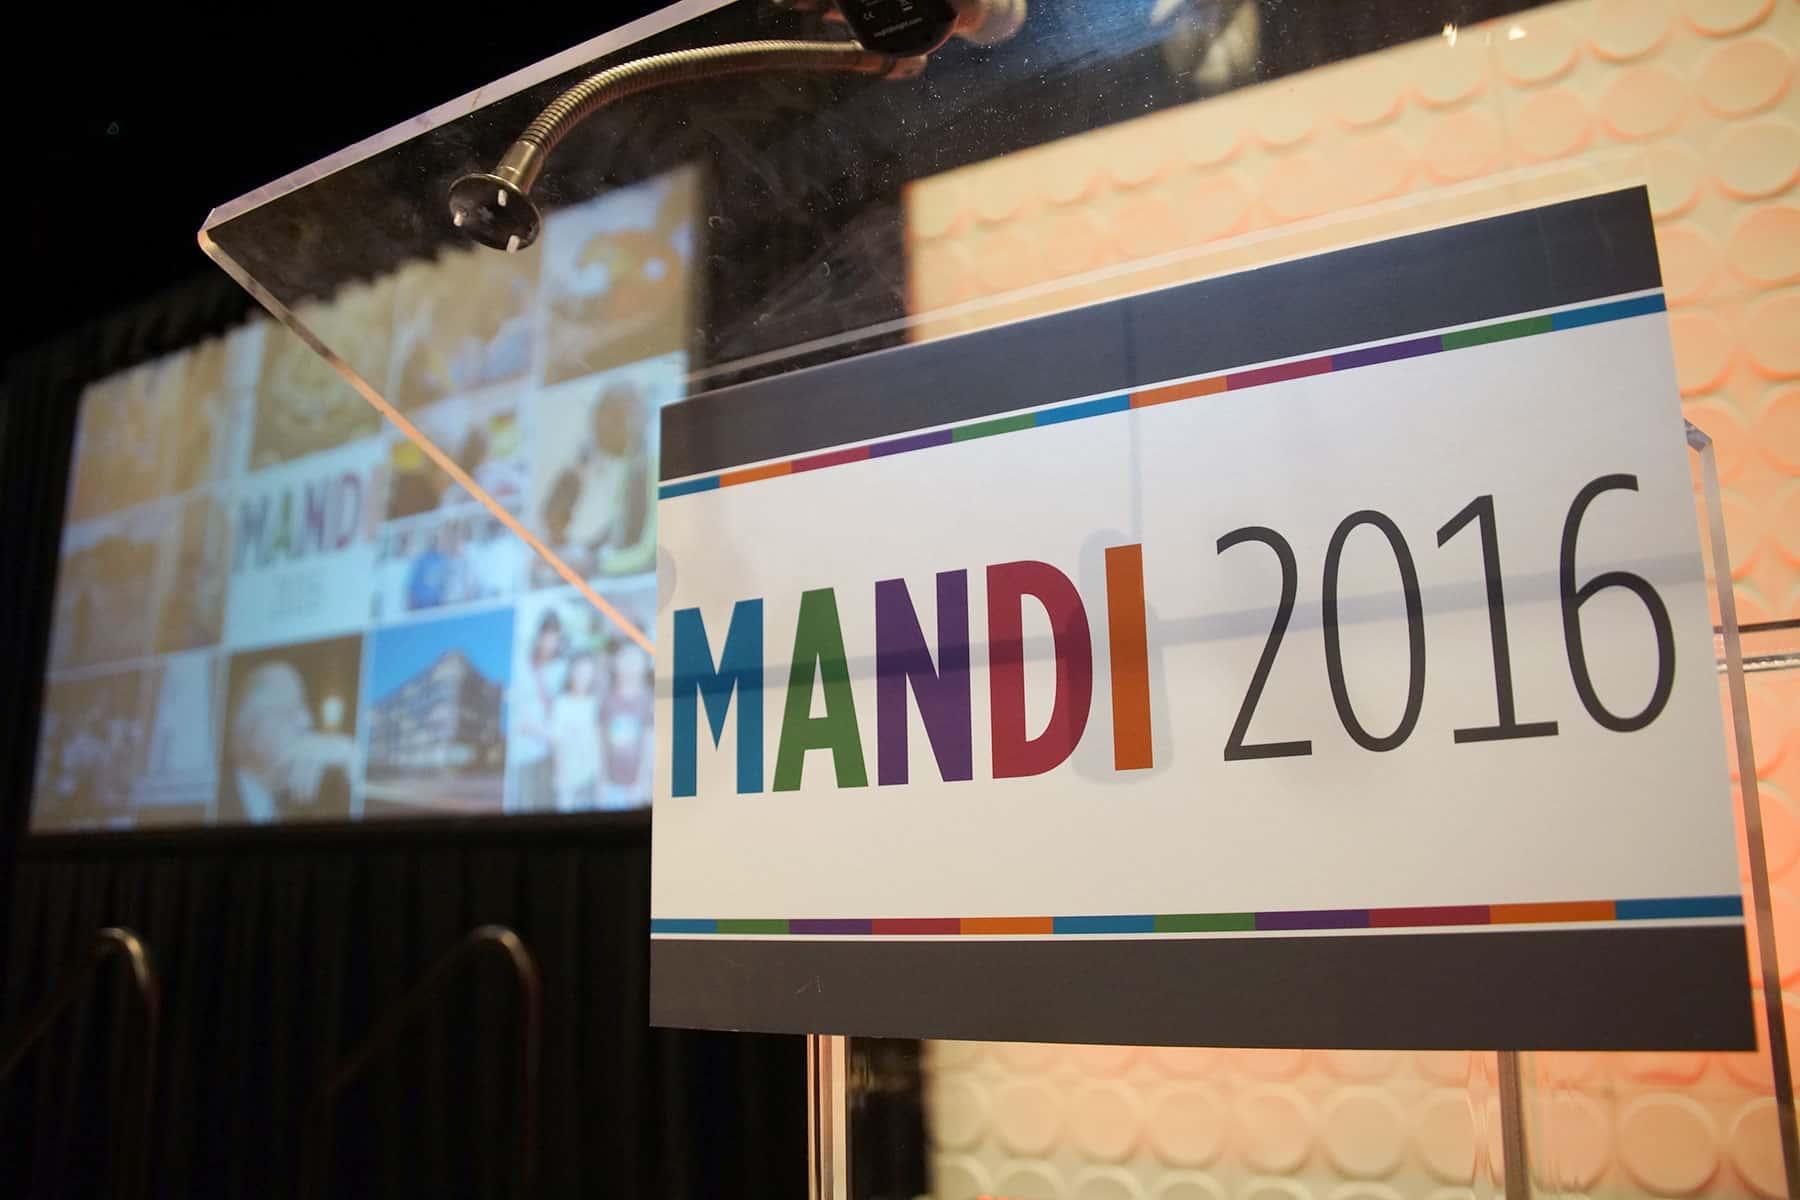 031615_MANDI2016_0116